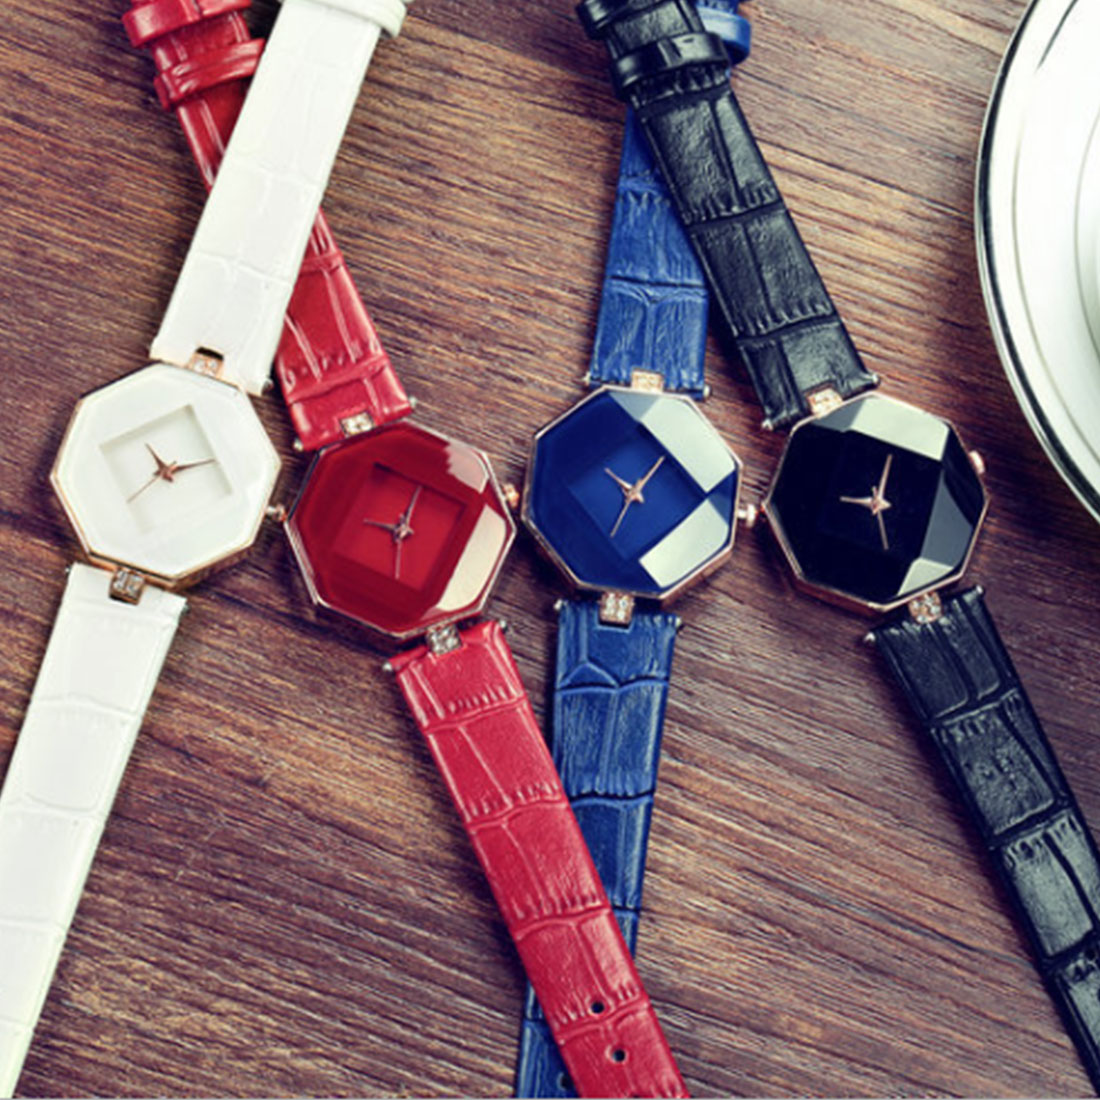 1pcs relogio feminino reloj mujer Leather Womens Quartz Bracelet Watch Crystal Diamond Wrist Gift